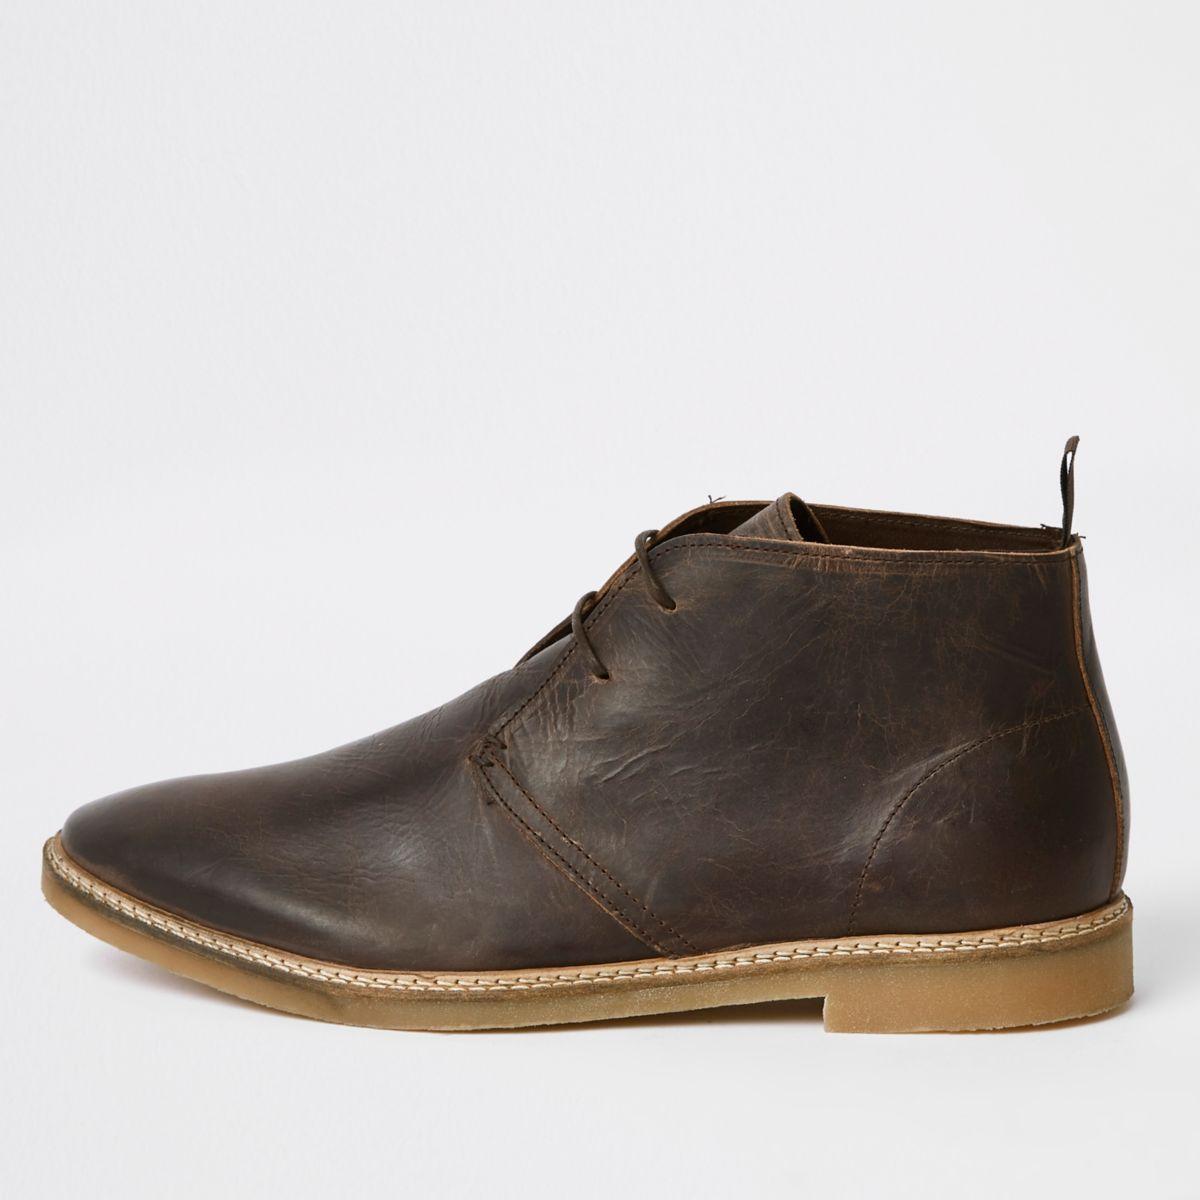 Dark brown leather eyelet desert boots